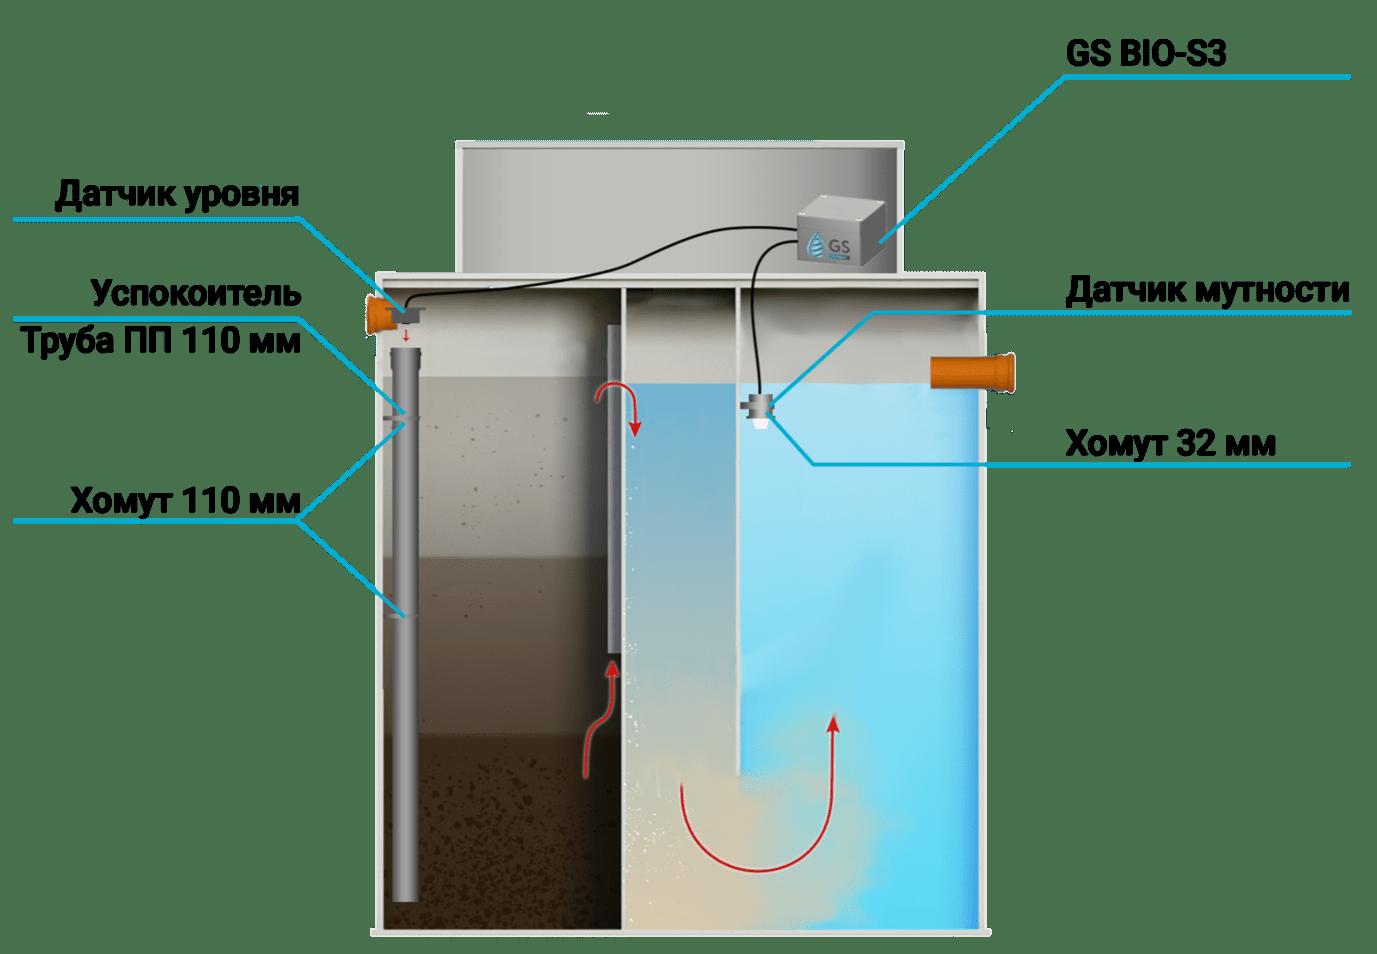 Схема монтажа сигнализации для септика GS BIO-S4